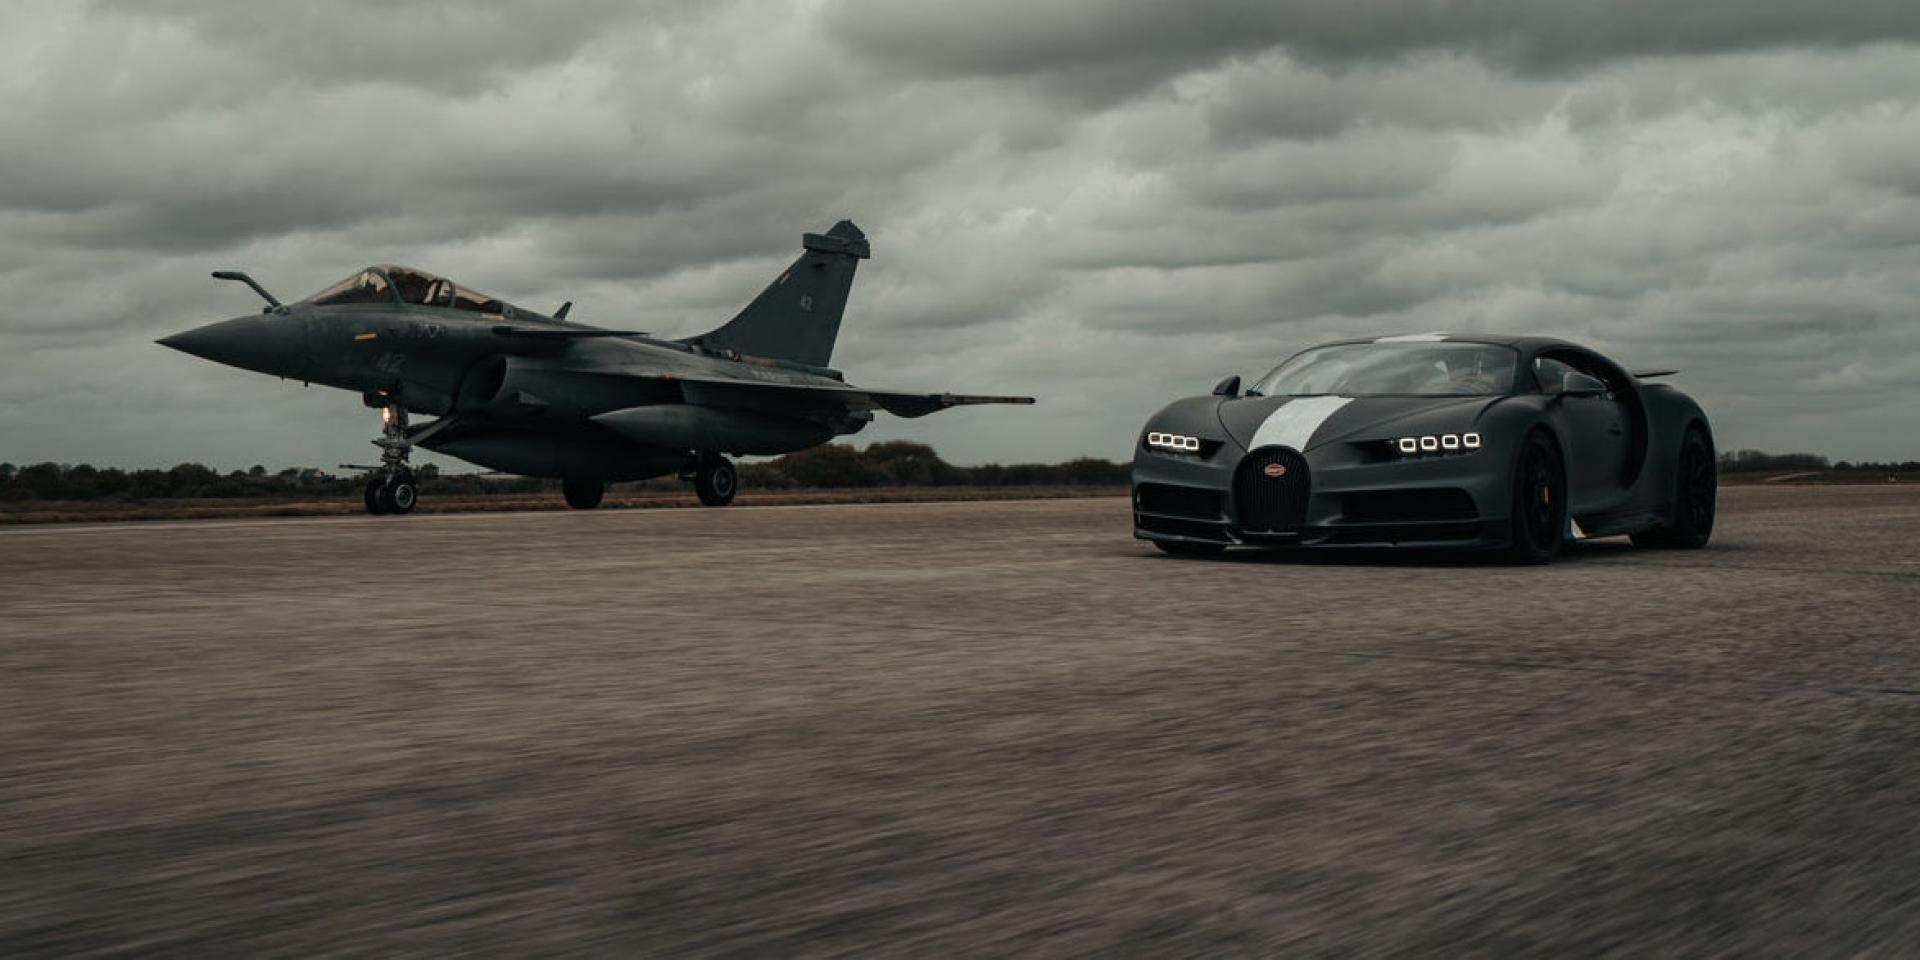 Bugatti Chiron Sport限量版再度對決戰鬥機!1500匹 VS 5700匹